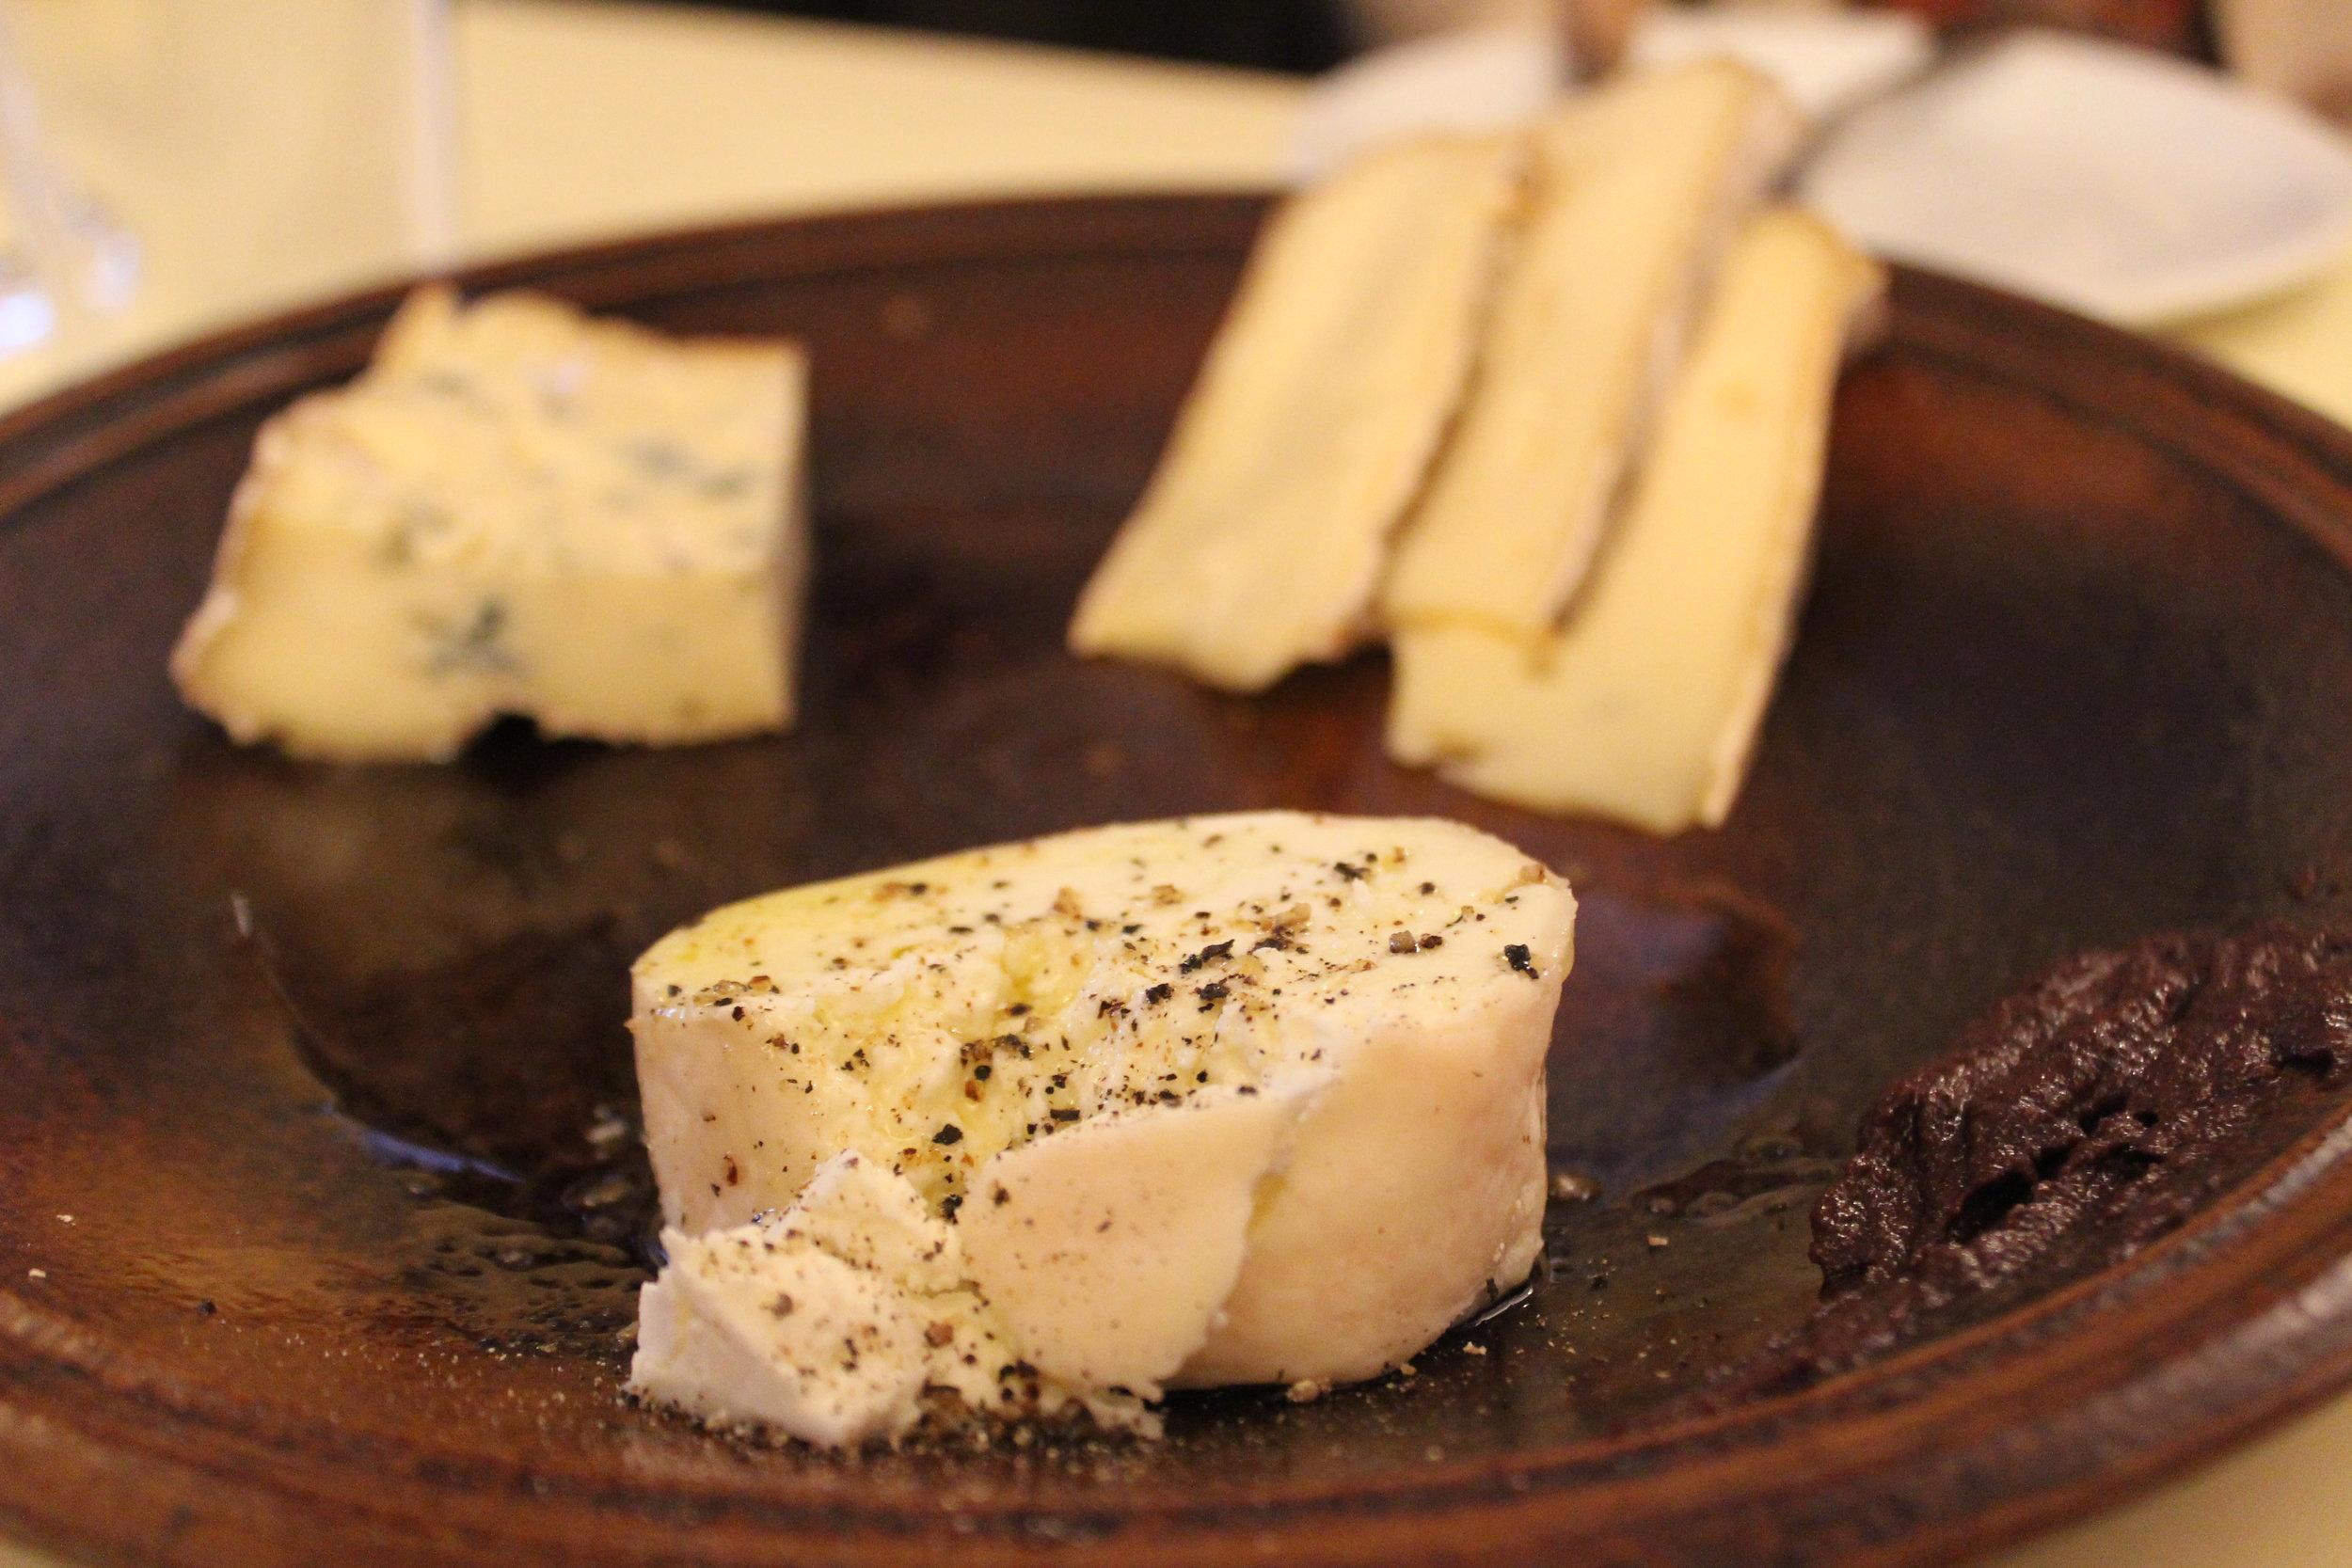 Cheese Plate: Saint Nectaire, Fourme d'Ambert, Crottin de Chavignol at Au Passage